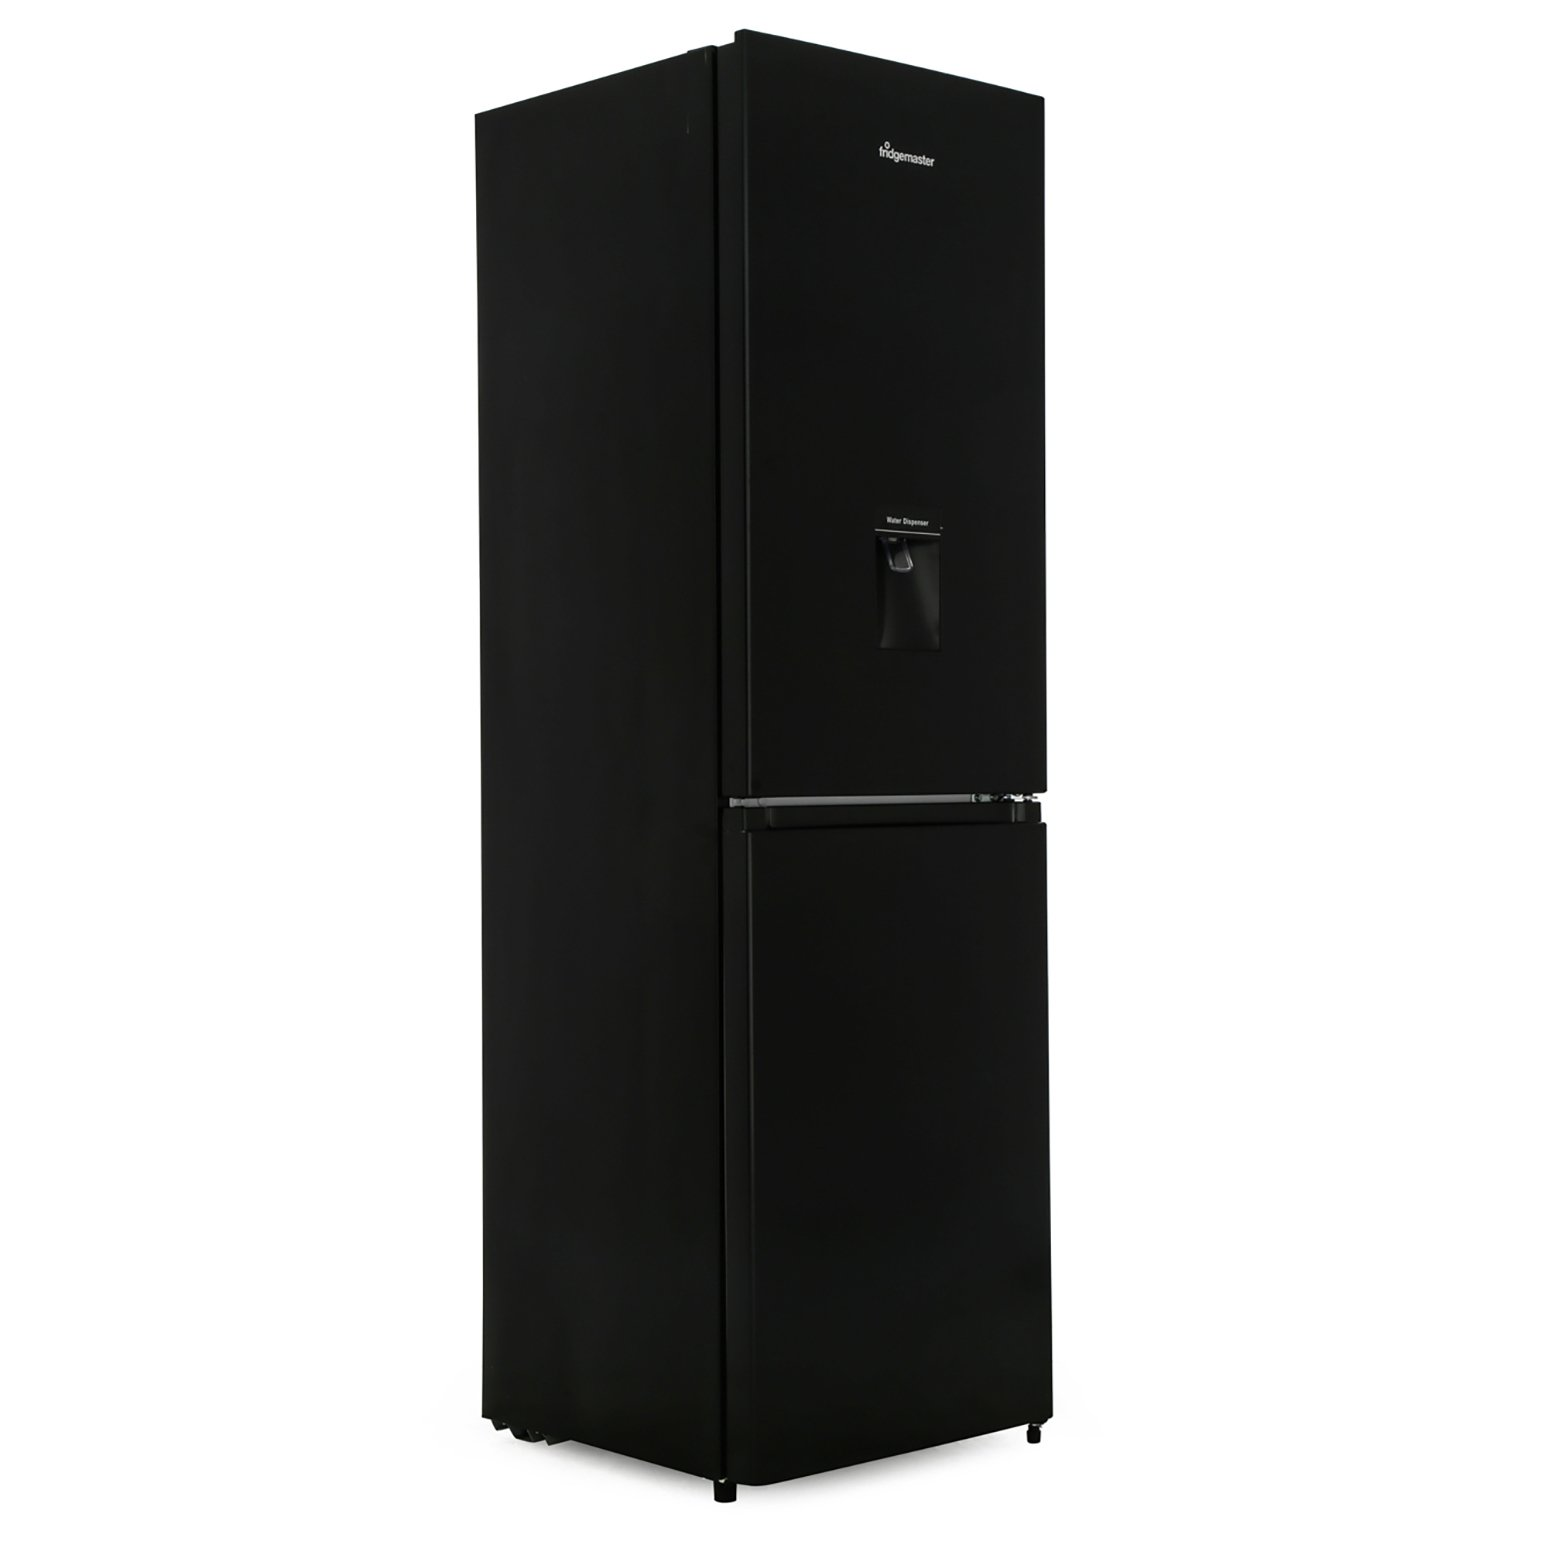 Fridgemaster MC55251MDB Frost Free Fridge Freezer